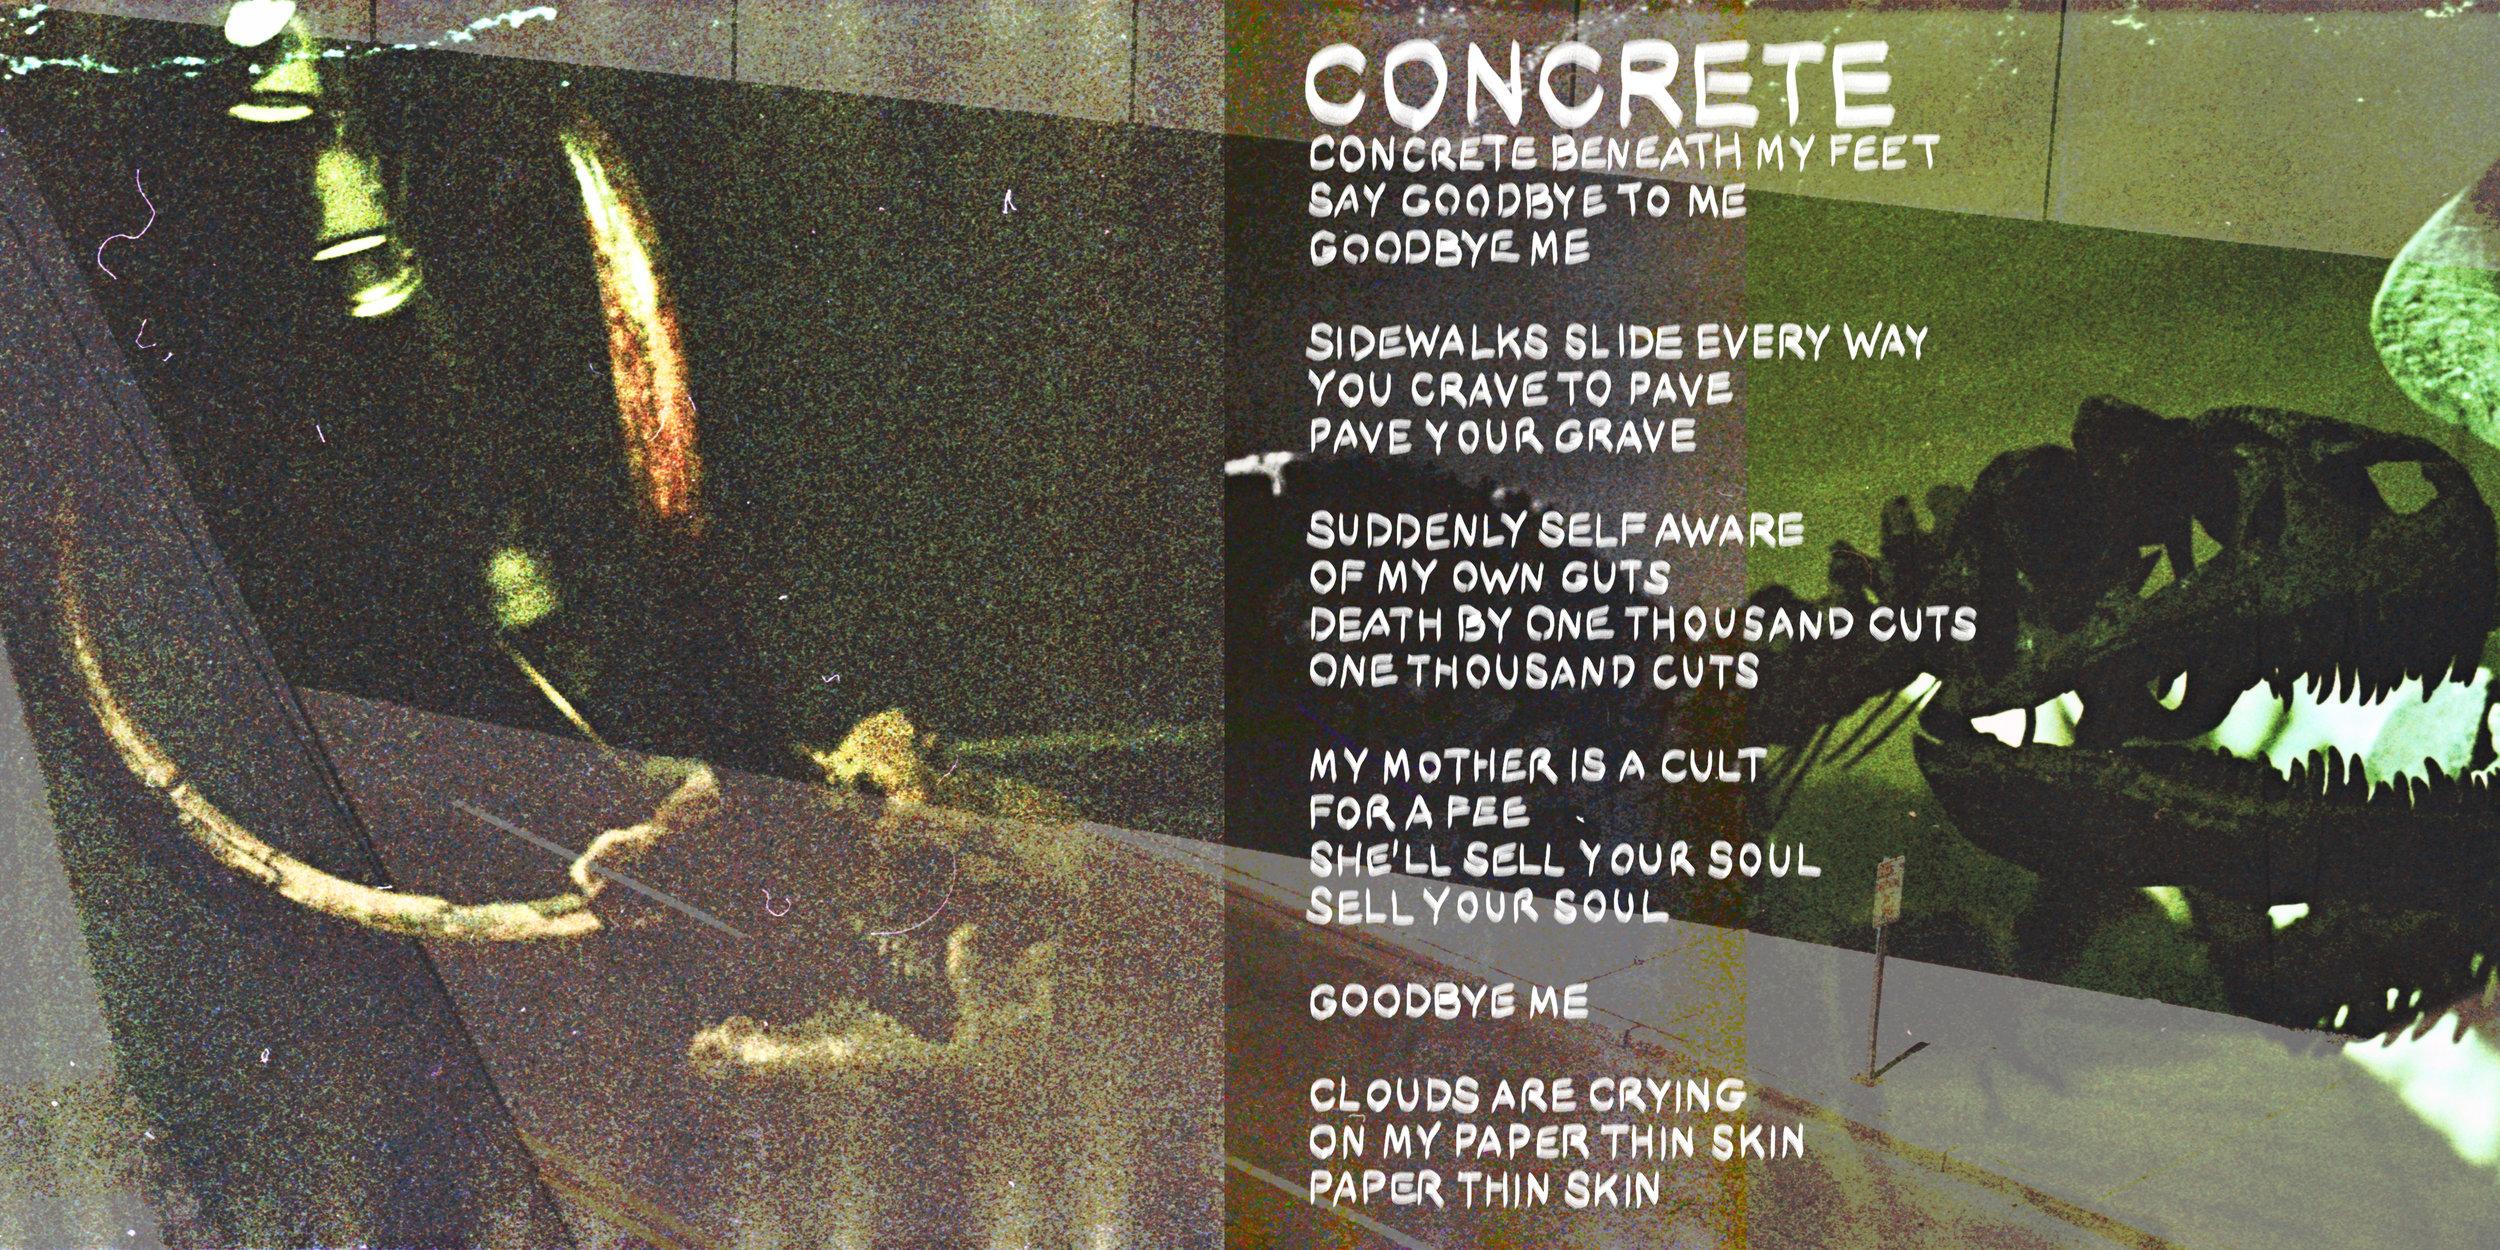 07ConcreteBOOKLET.jpg